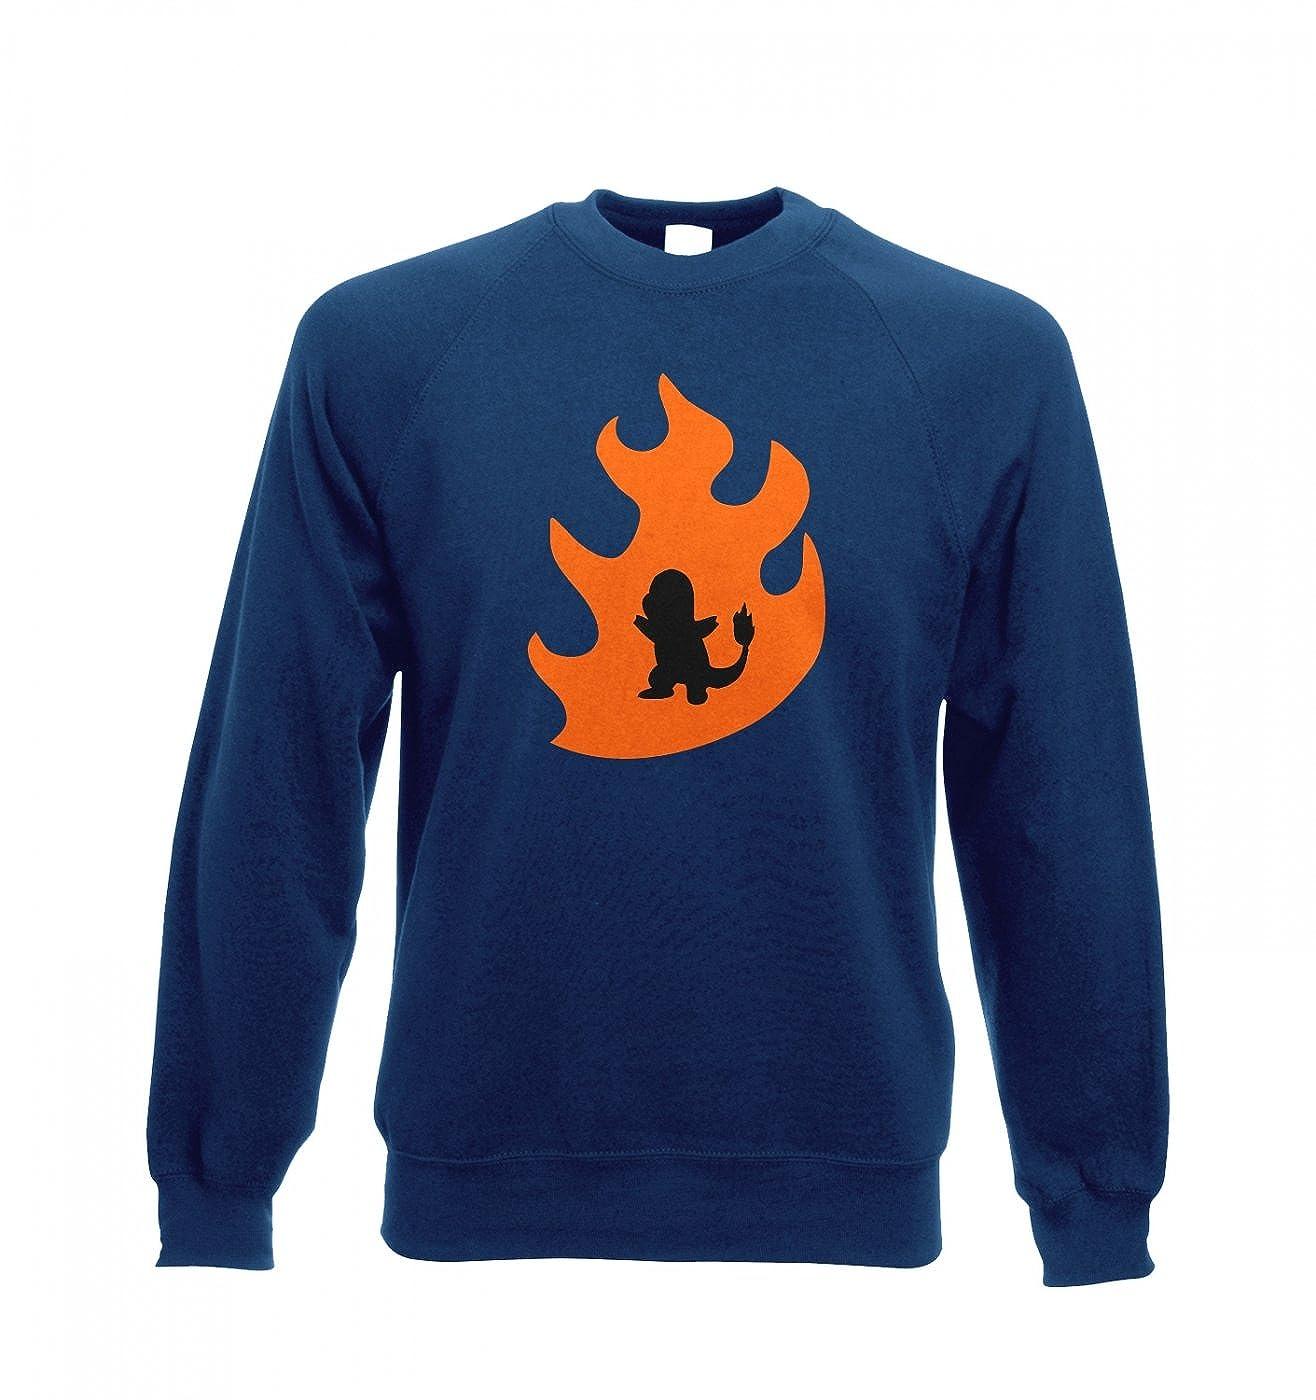 d33b7ee7 Orange Charmander Silhouette Adult Crewneck Sweatshirt - Inspired By Pokemon  (Small (40